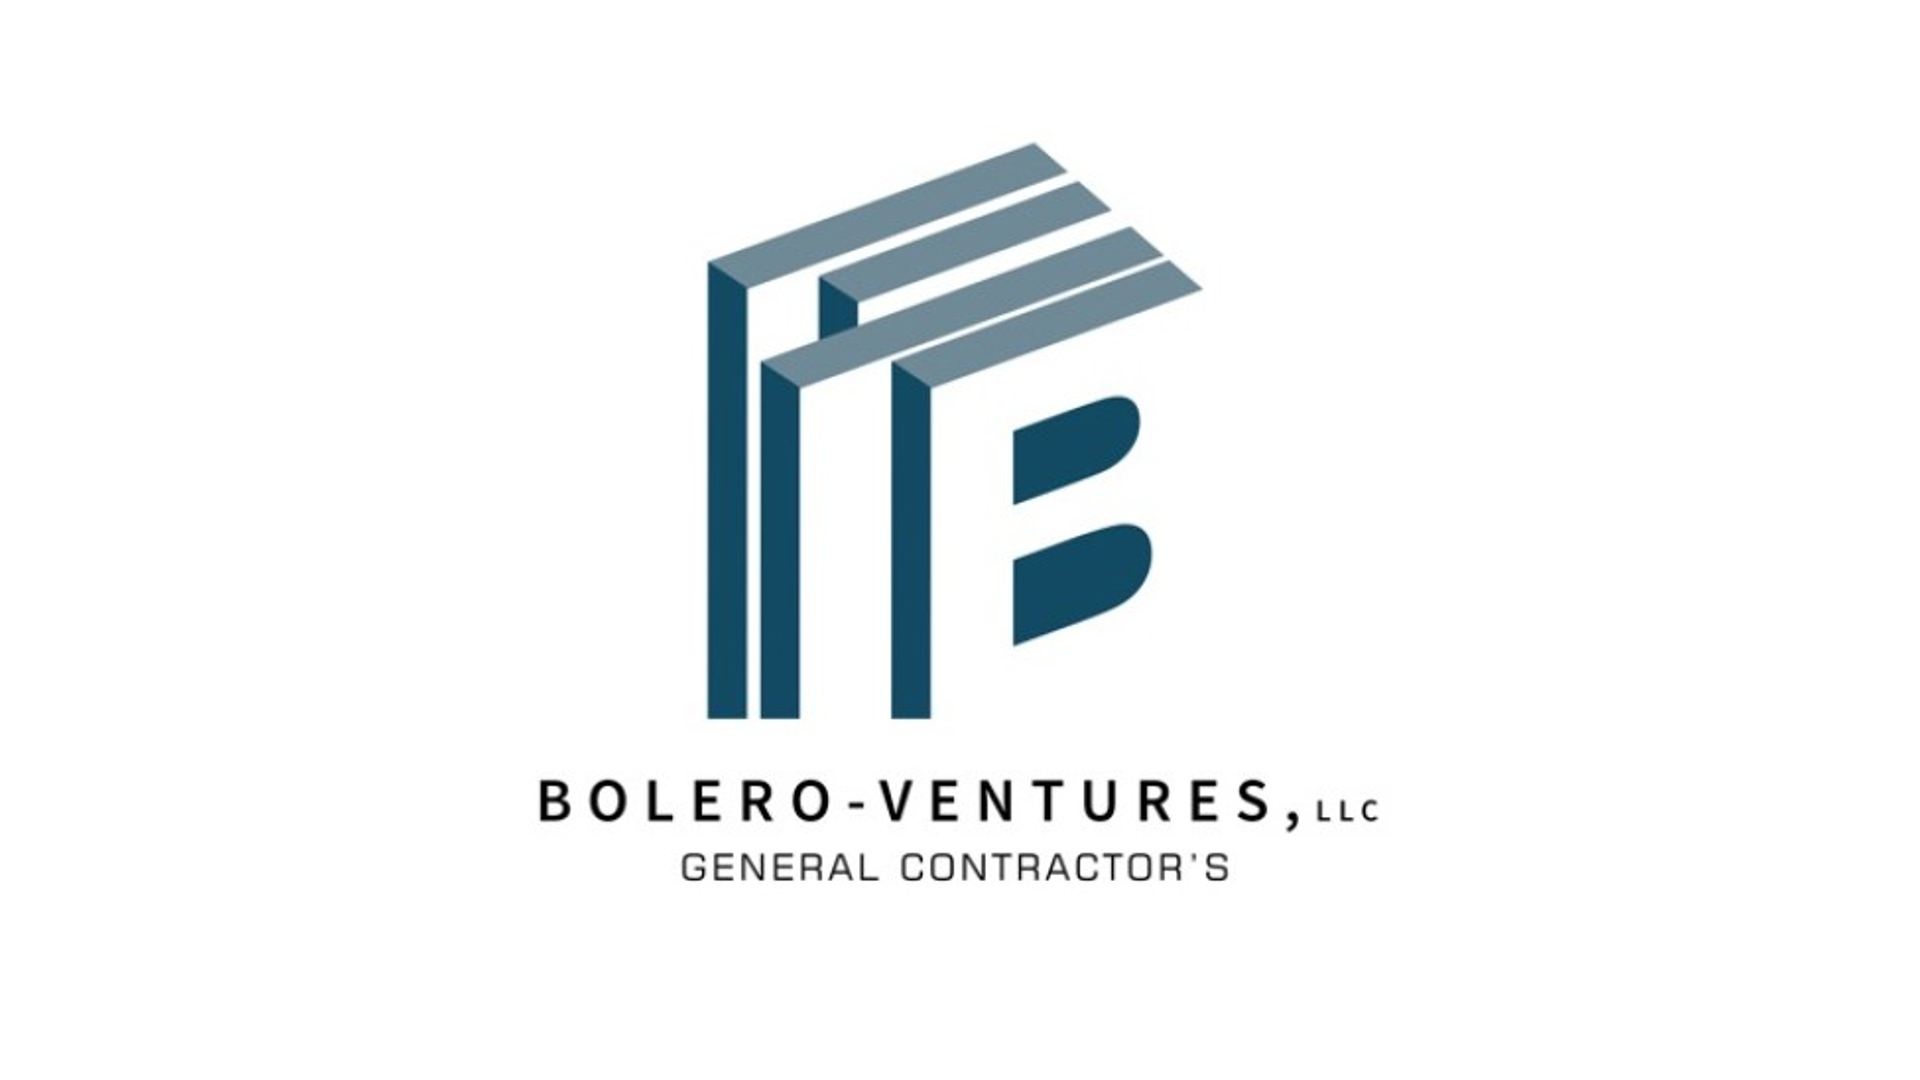 Bolero Ventures, LLC